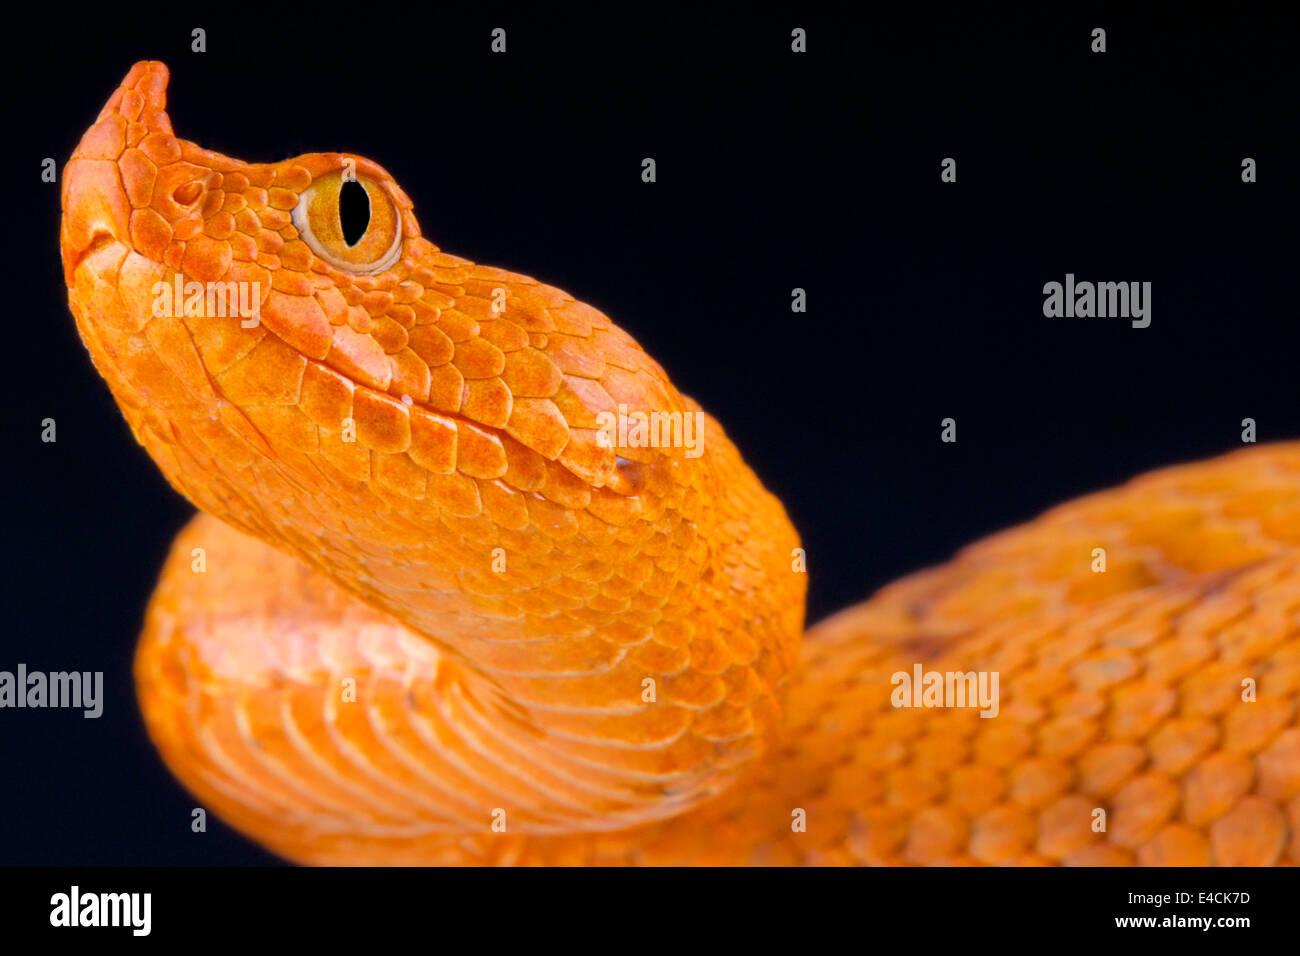 Larga nariz / Vipera ammodytes viper Imagen De Stock